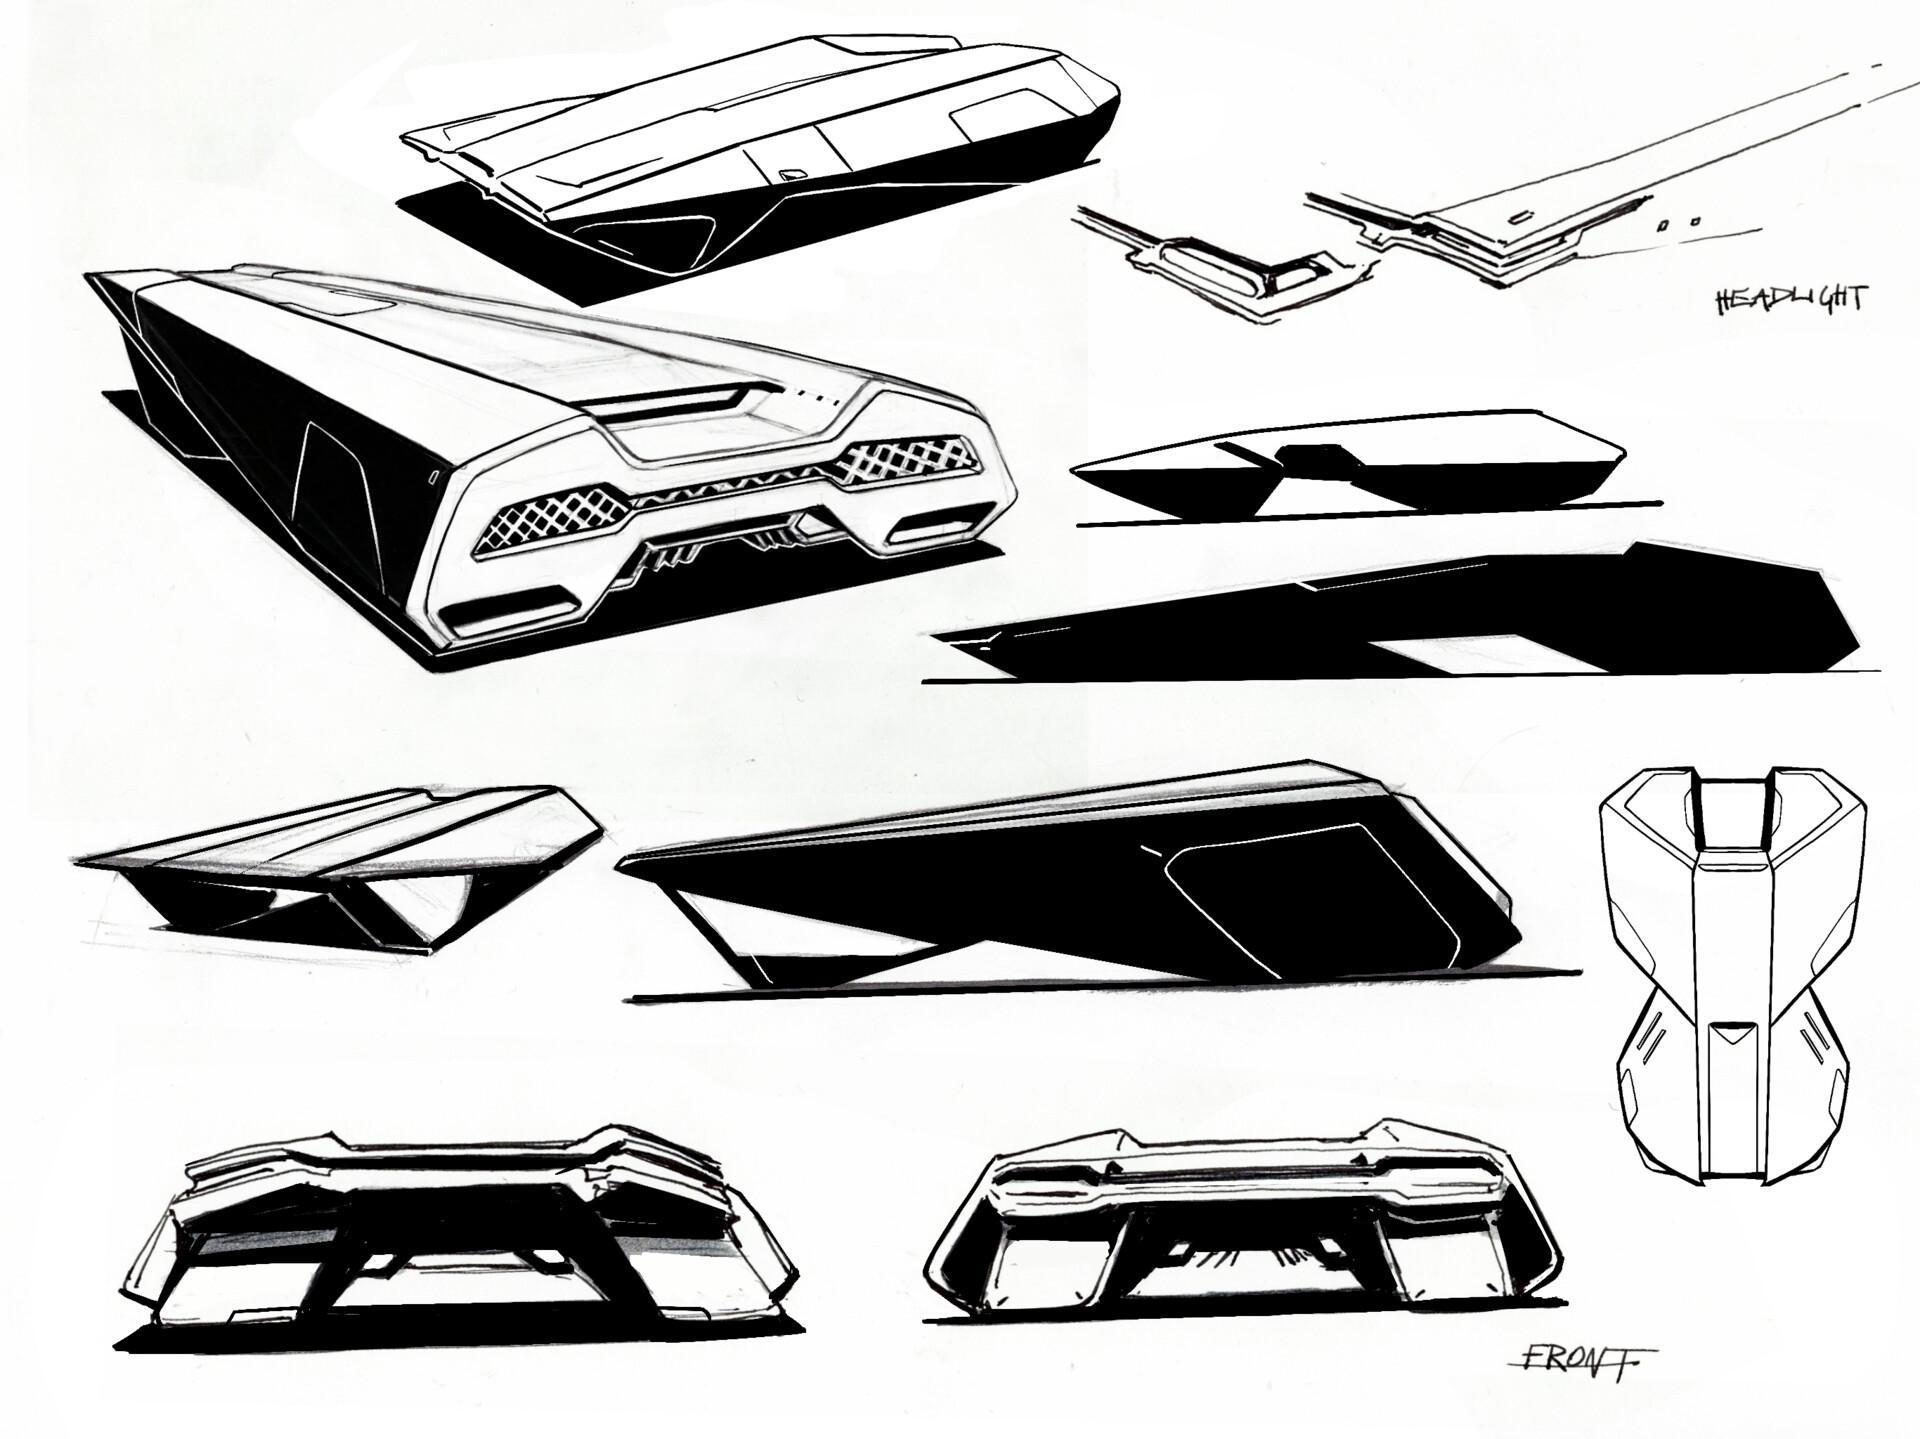 Minimalist Car design based on Lancia prototype.